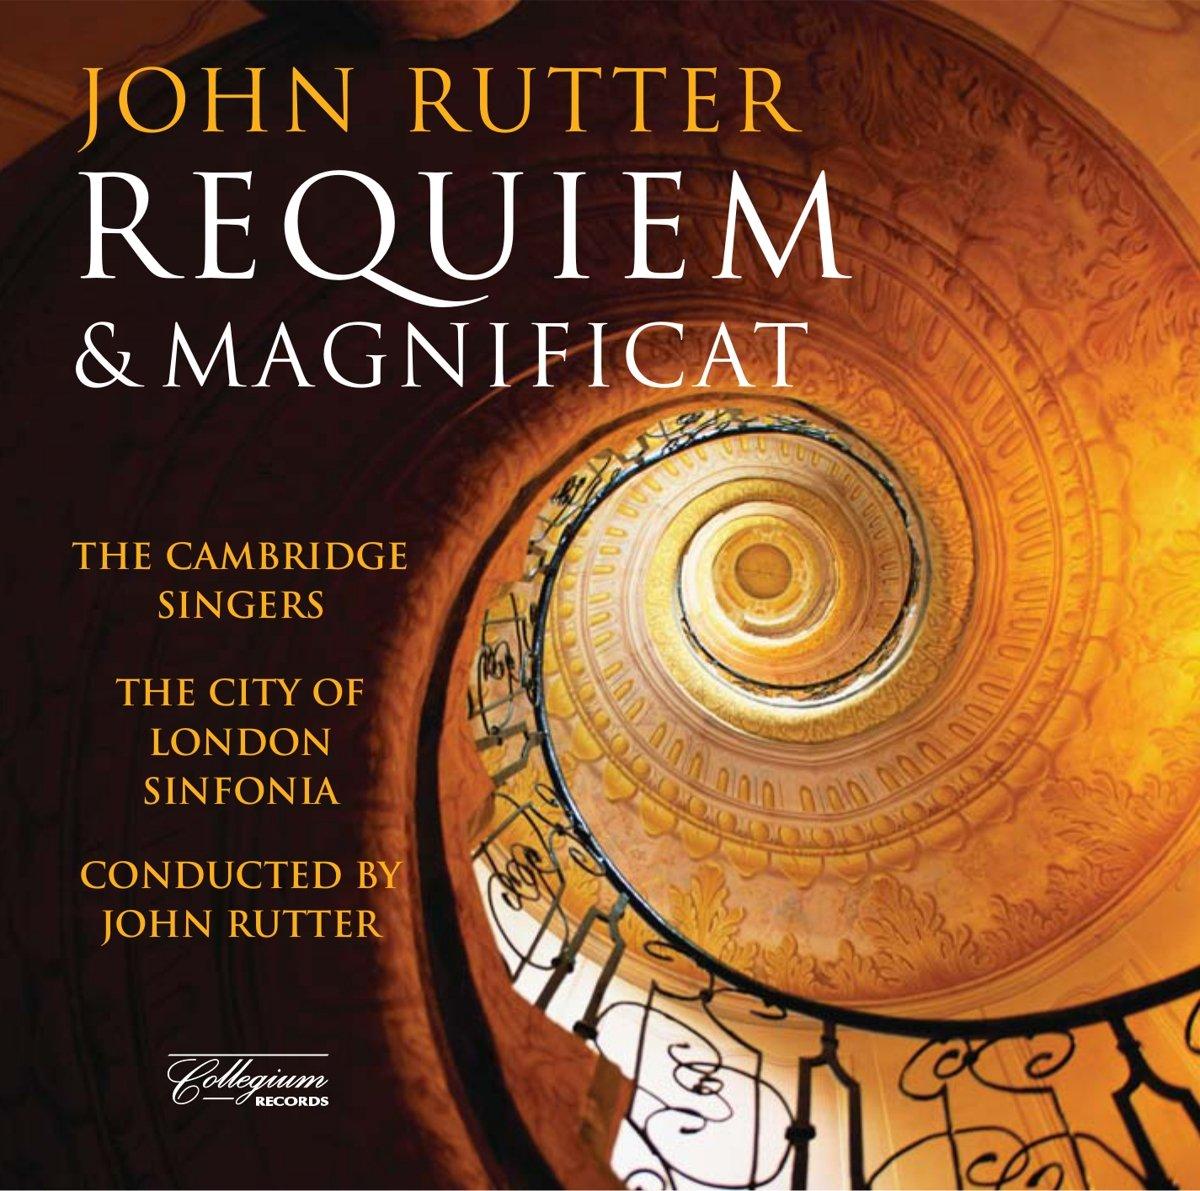 Rutter: Requiem & Magnificat by Collegium Records